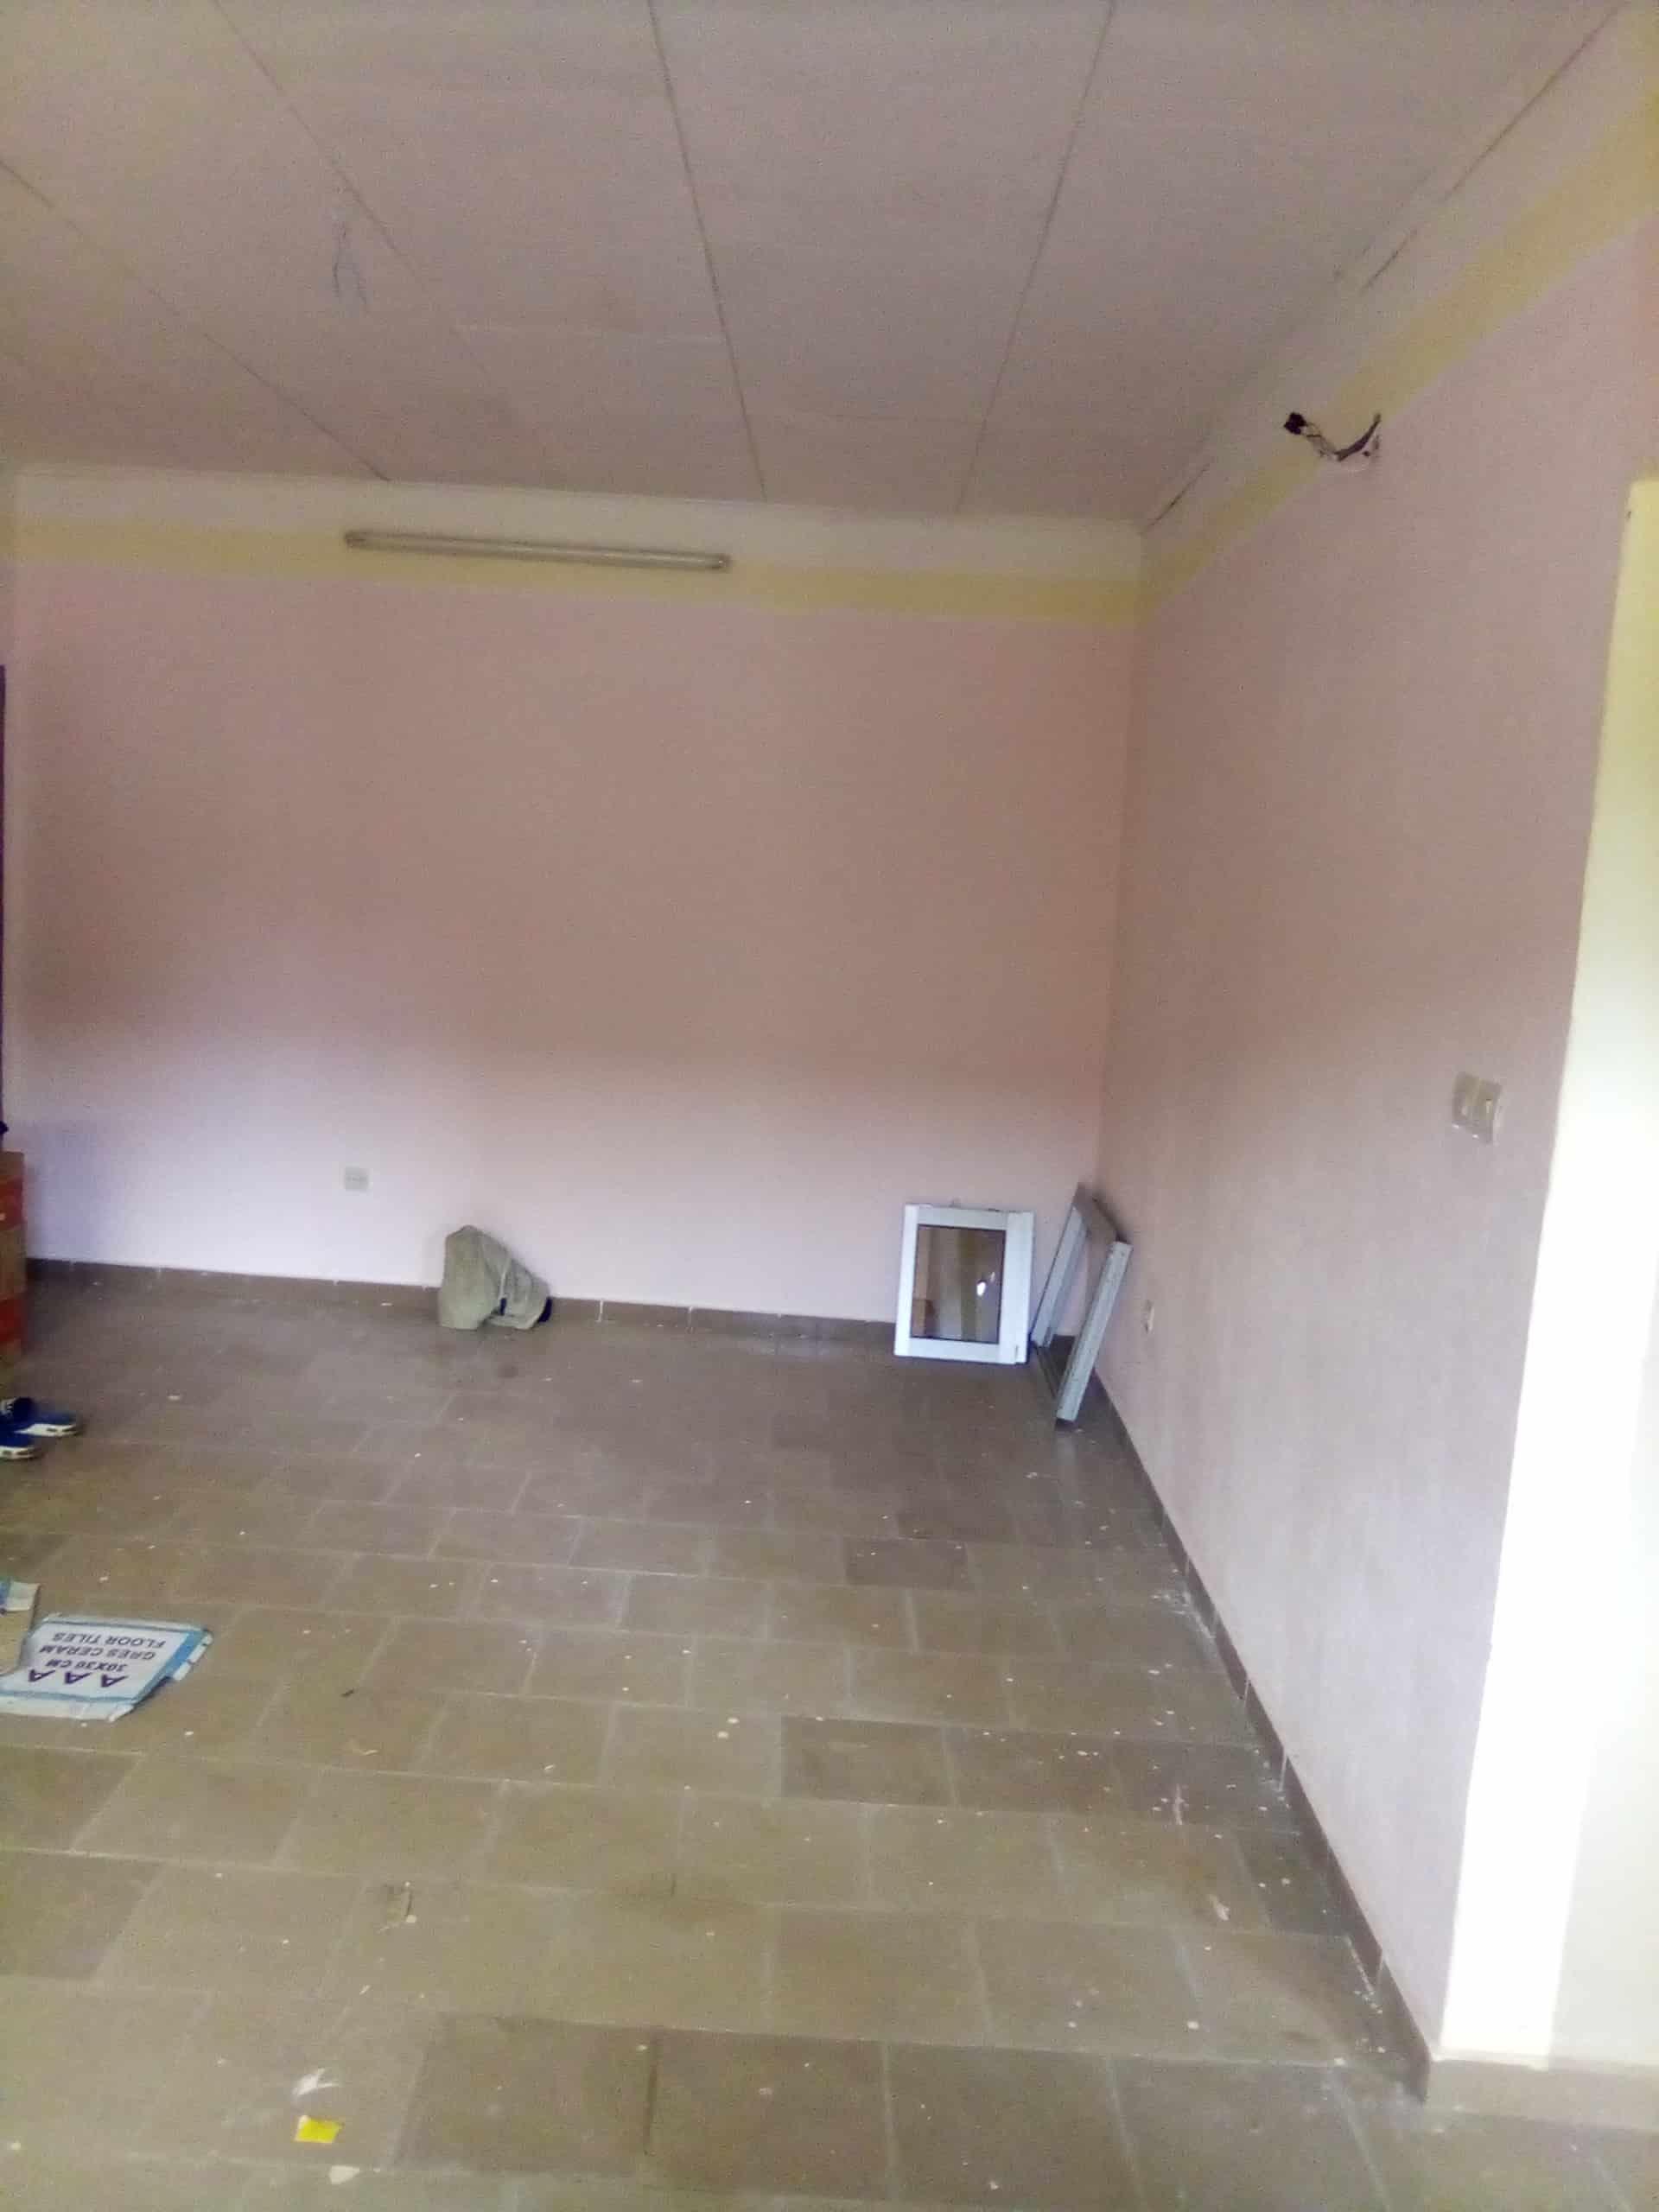 Apartment to rent - Douala, Logpom, Montana city - 1 living room(s), 2 bedroom(s), 1 bathroom(s) - 75 000 FCFA / month